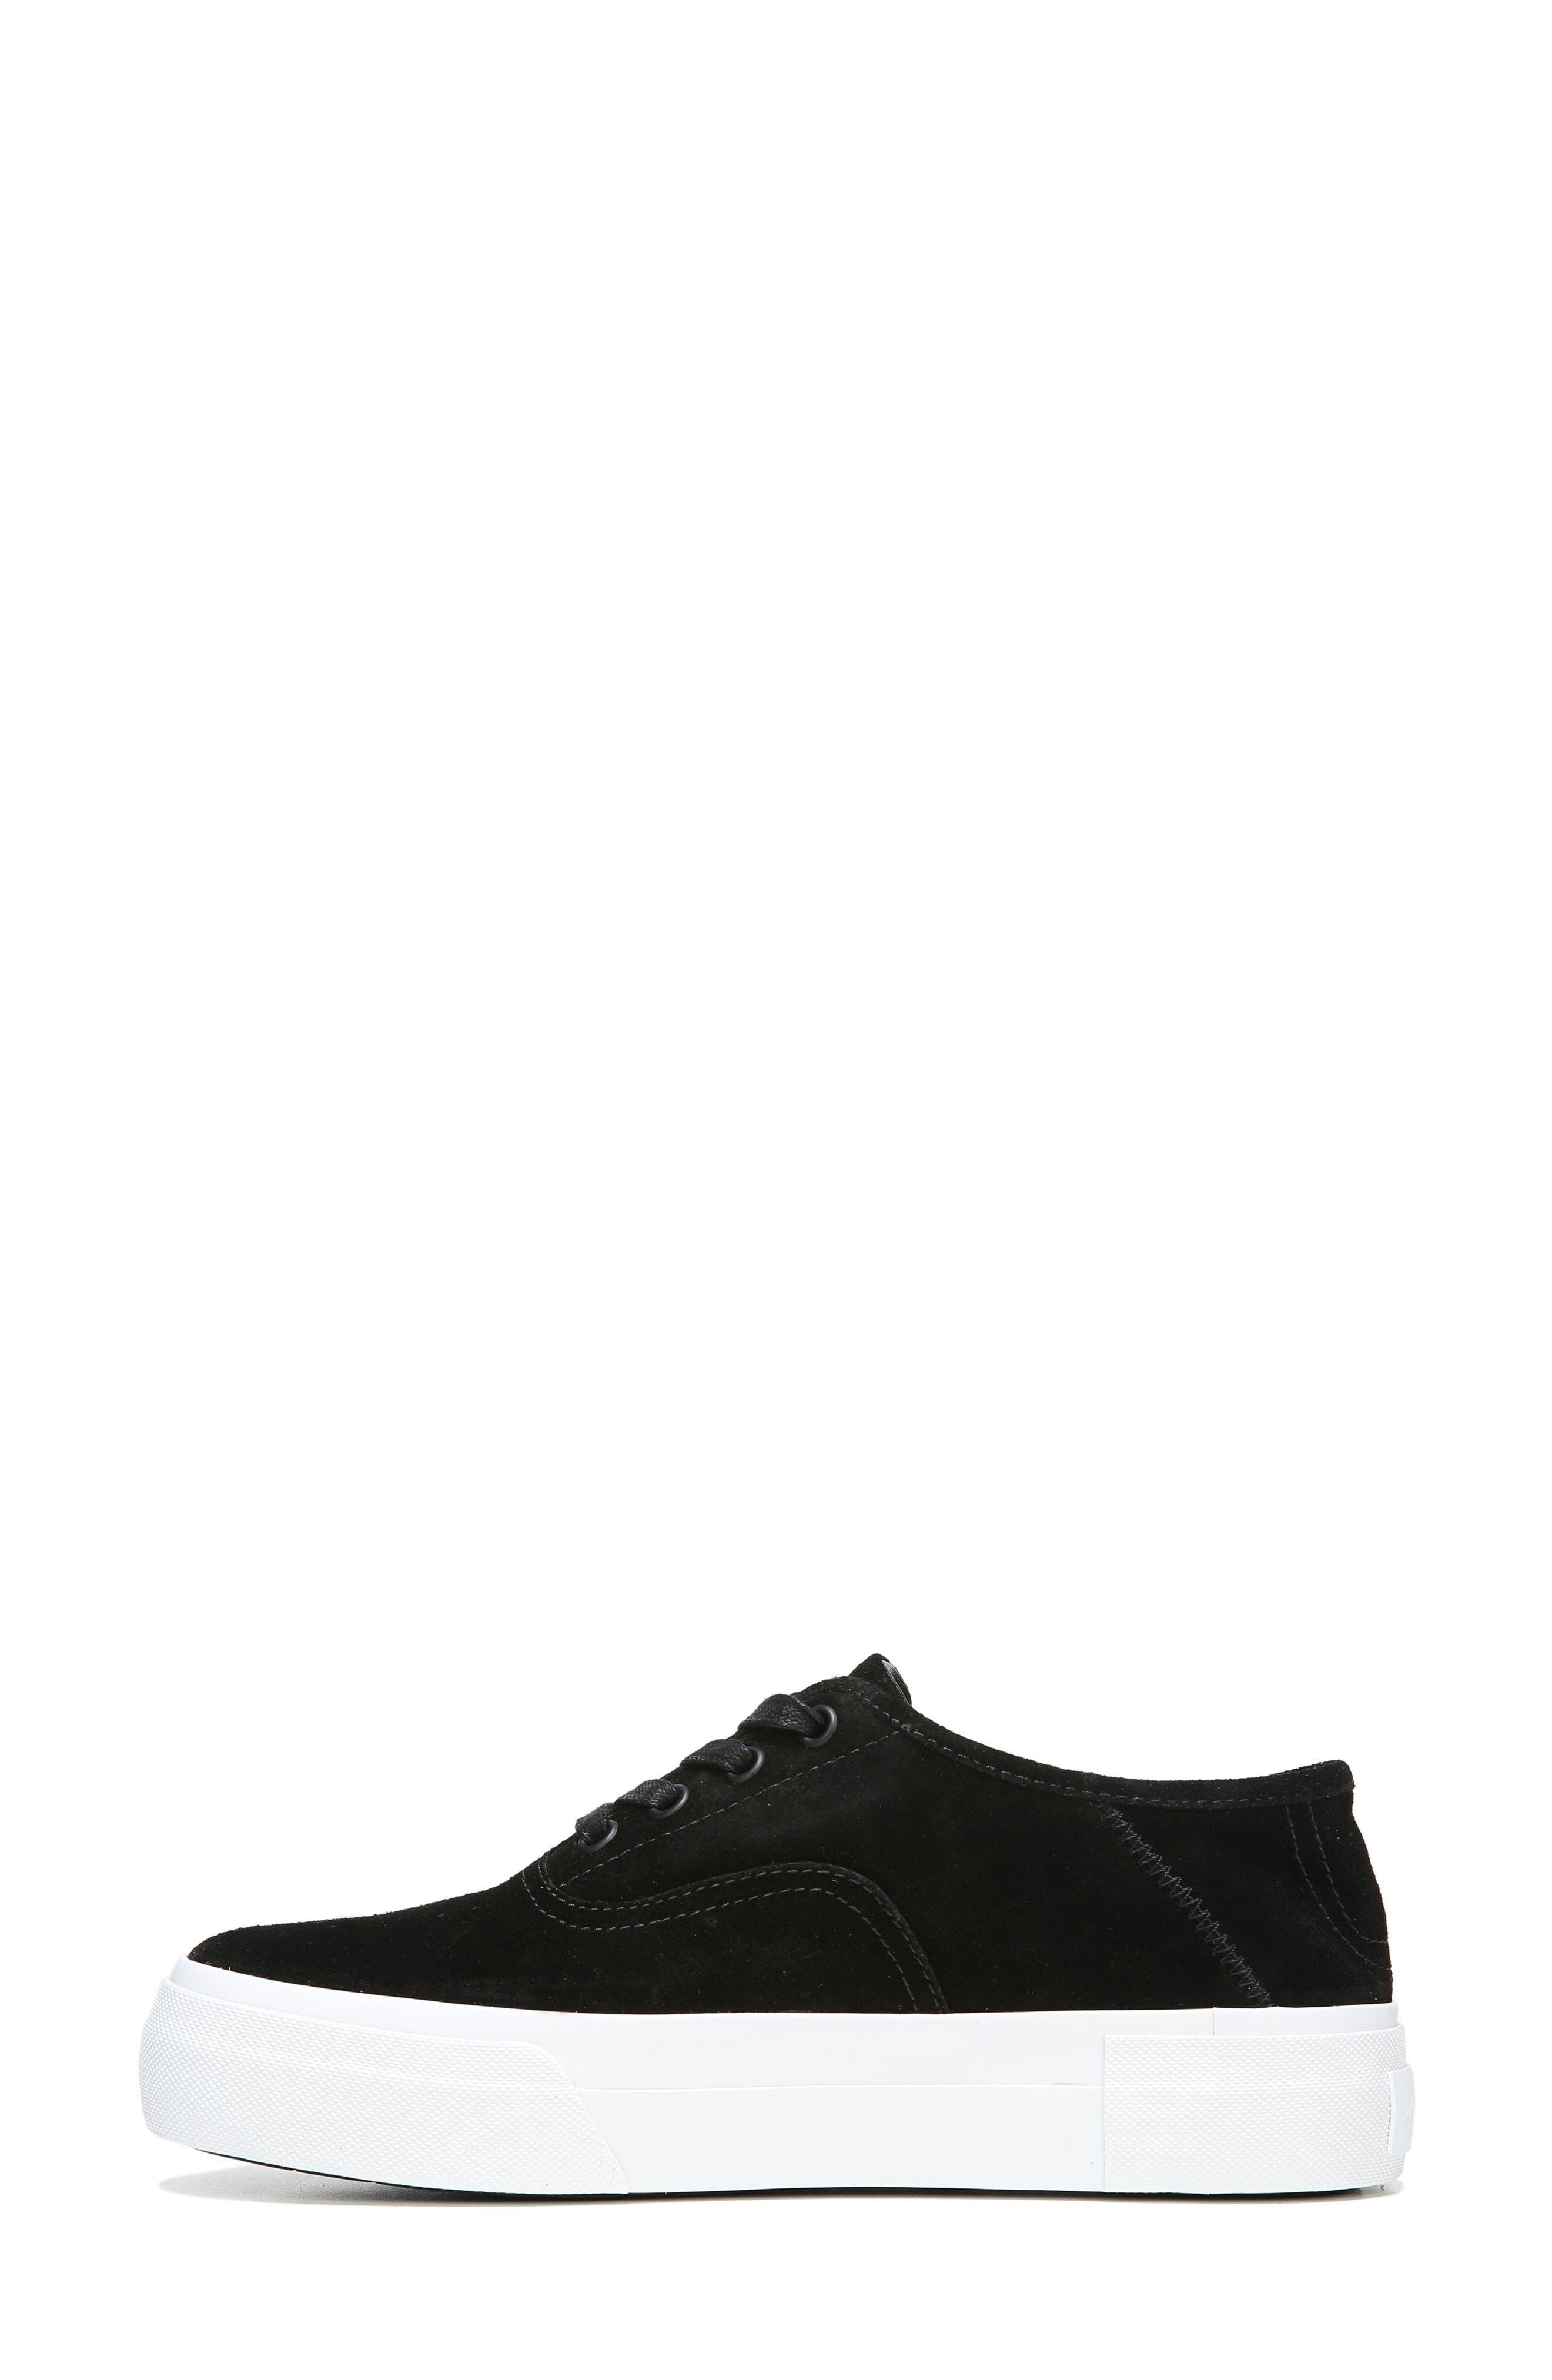 Copley Platform Sneaker,                             Alternate thumbnail 8, color,                             001